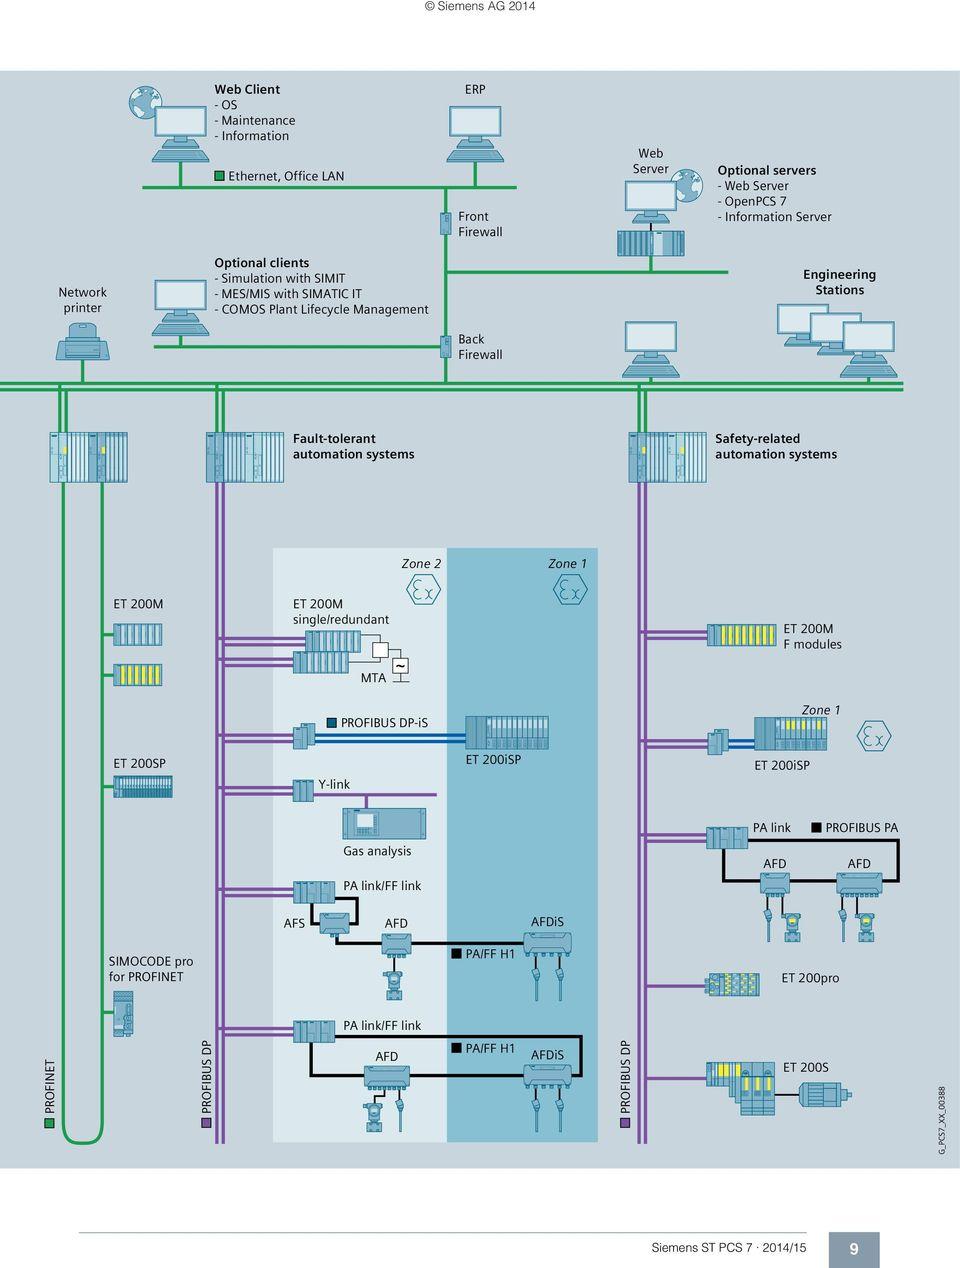 medium resolution of automation systems zone 2 zone 1 et 200m et 200m single redundant et 200m f